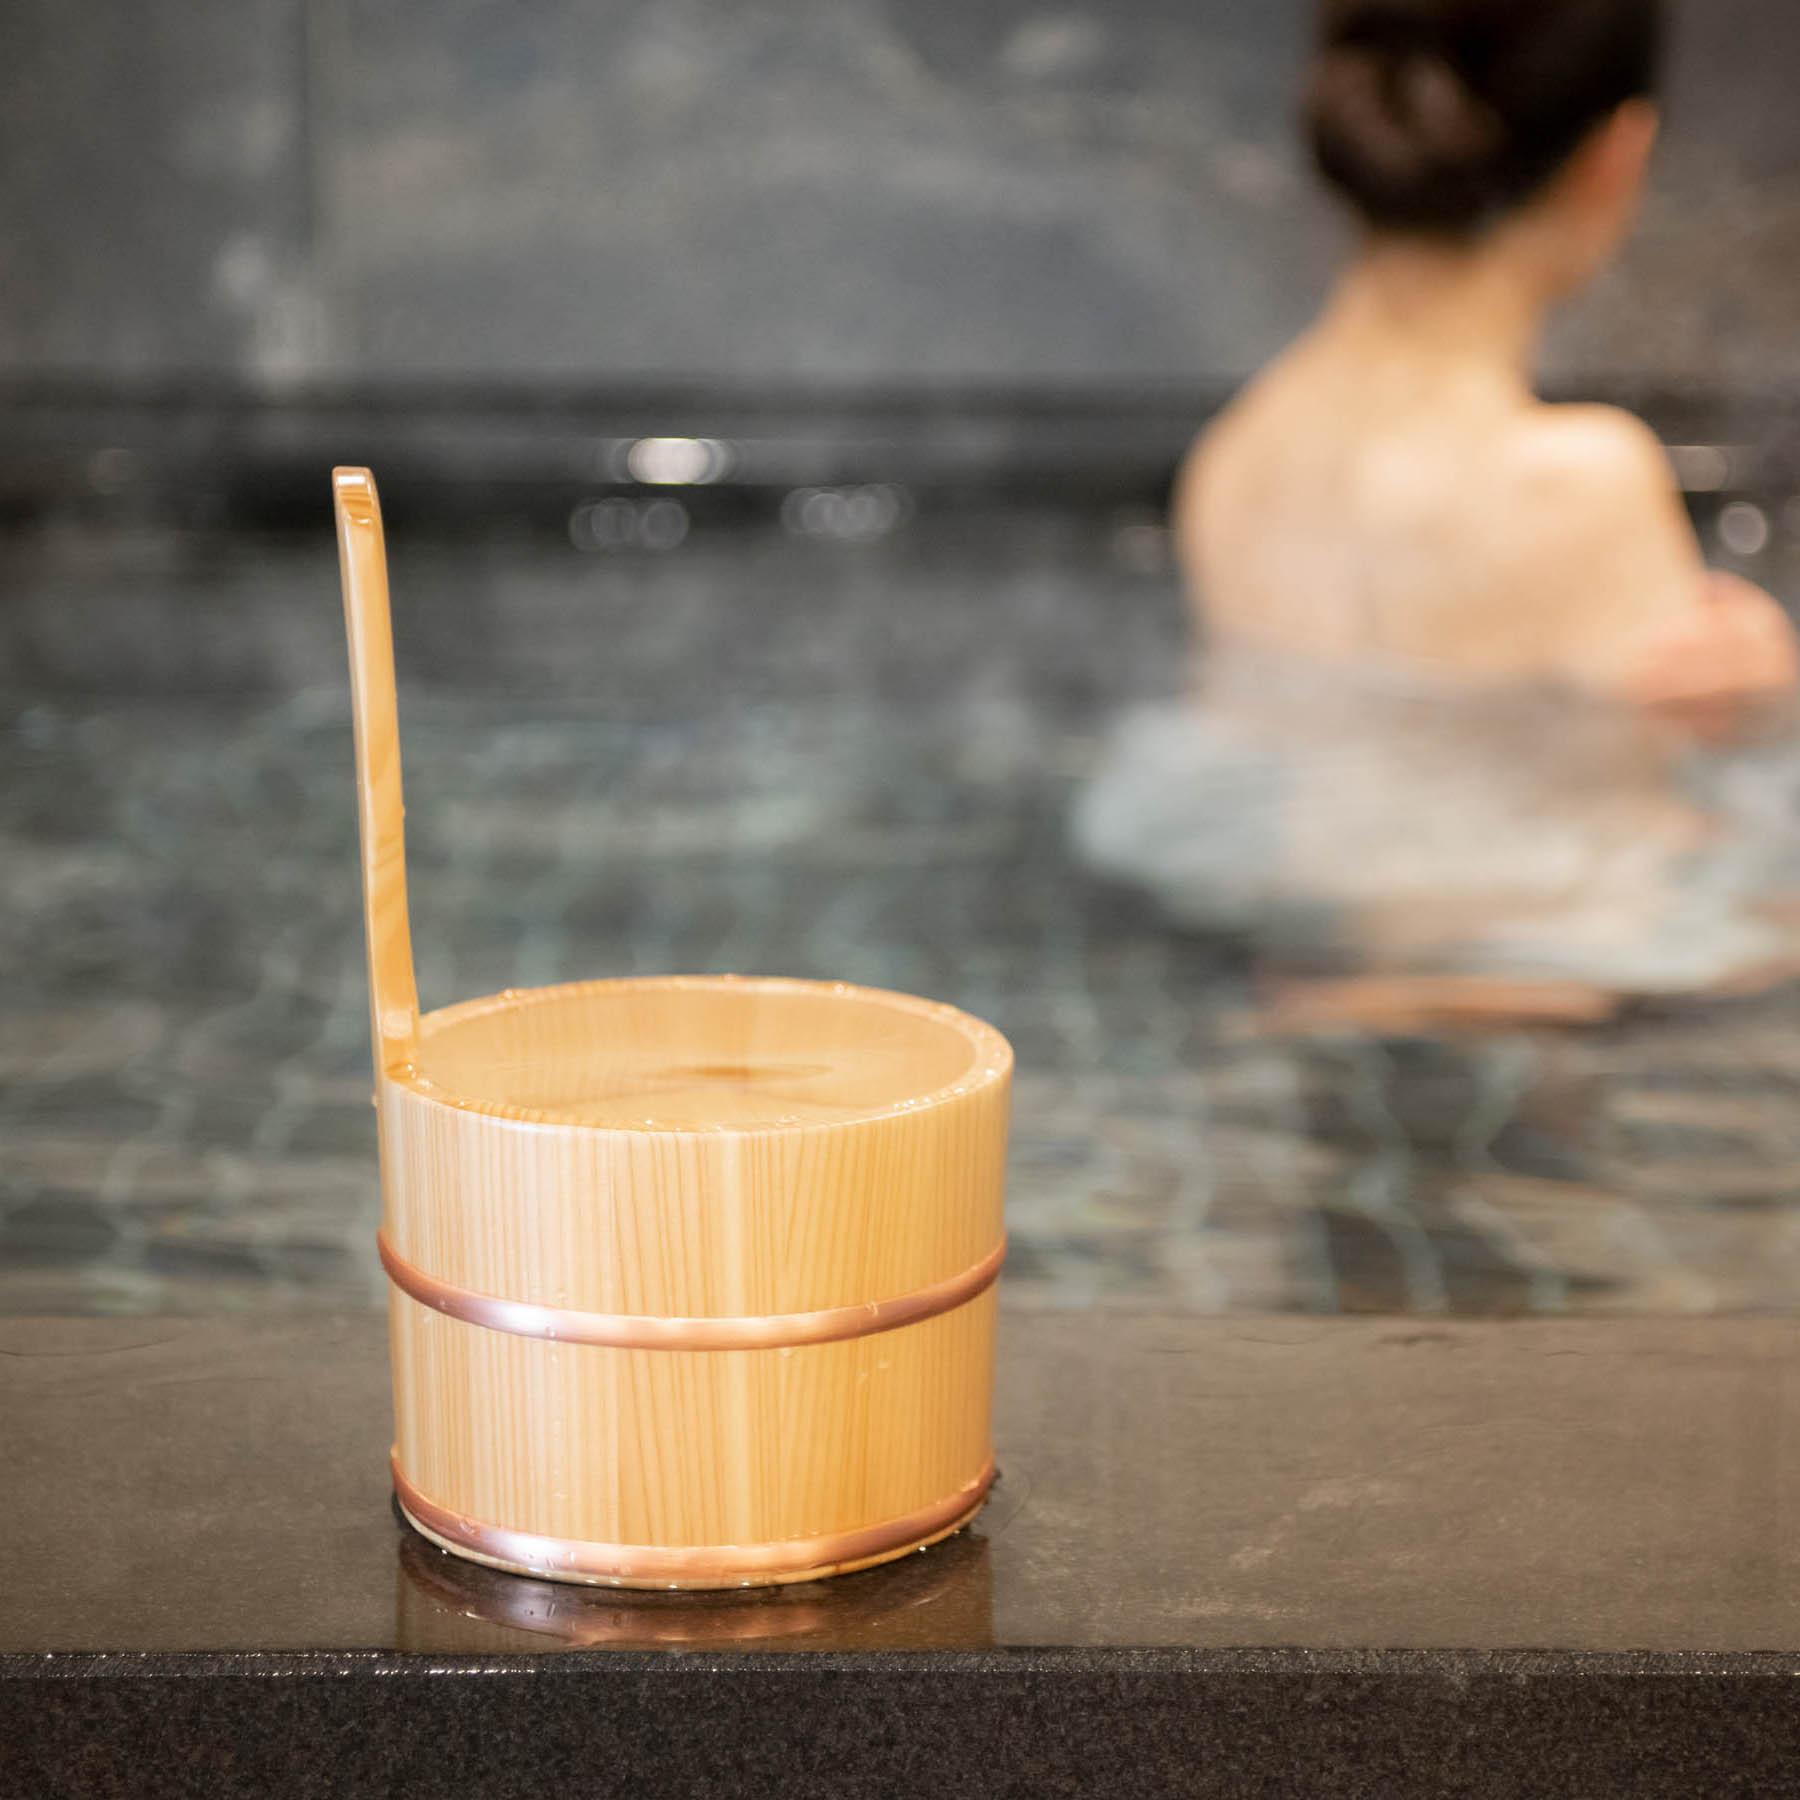 【Natural】梅屋敷の湯(うめやしきのゆ)健康促進・疲労回復・美肌効果